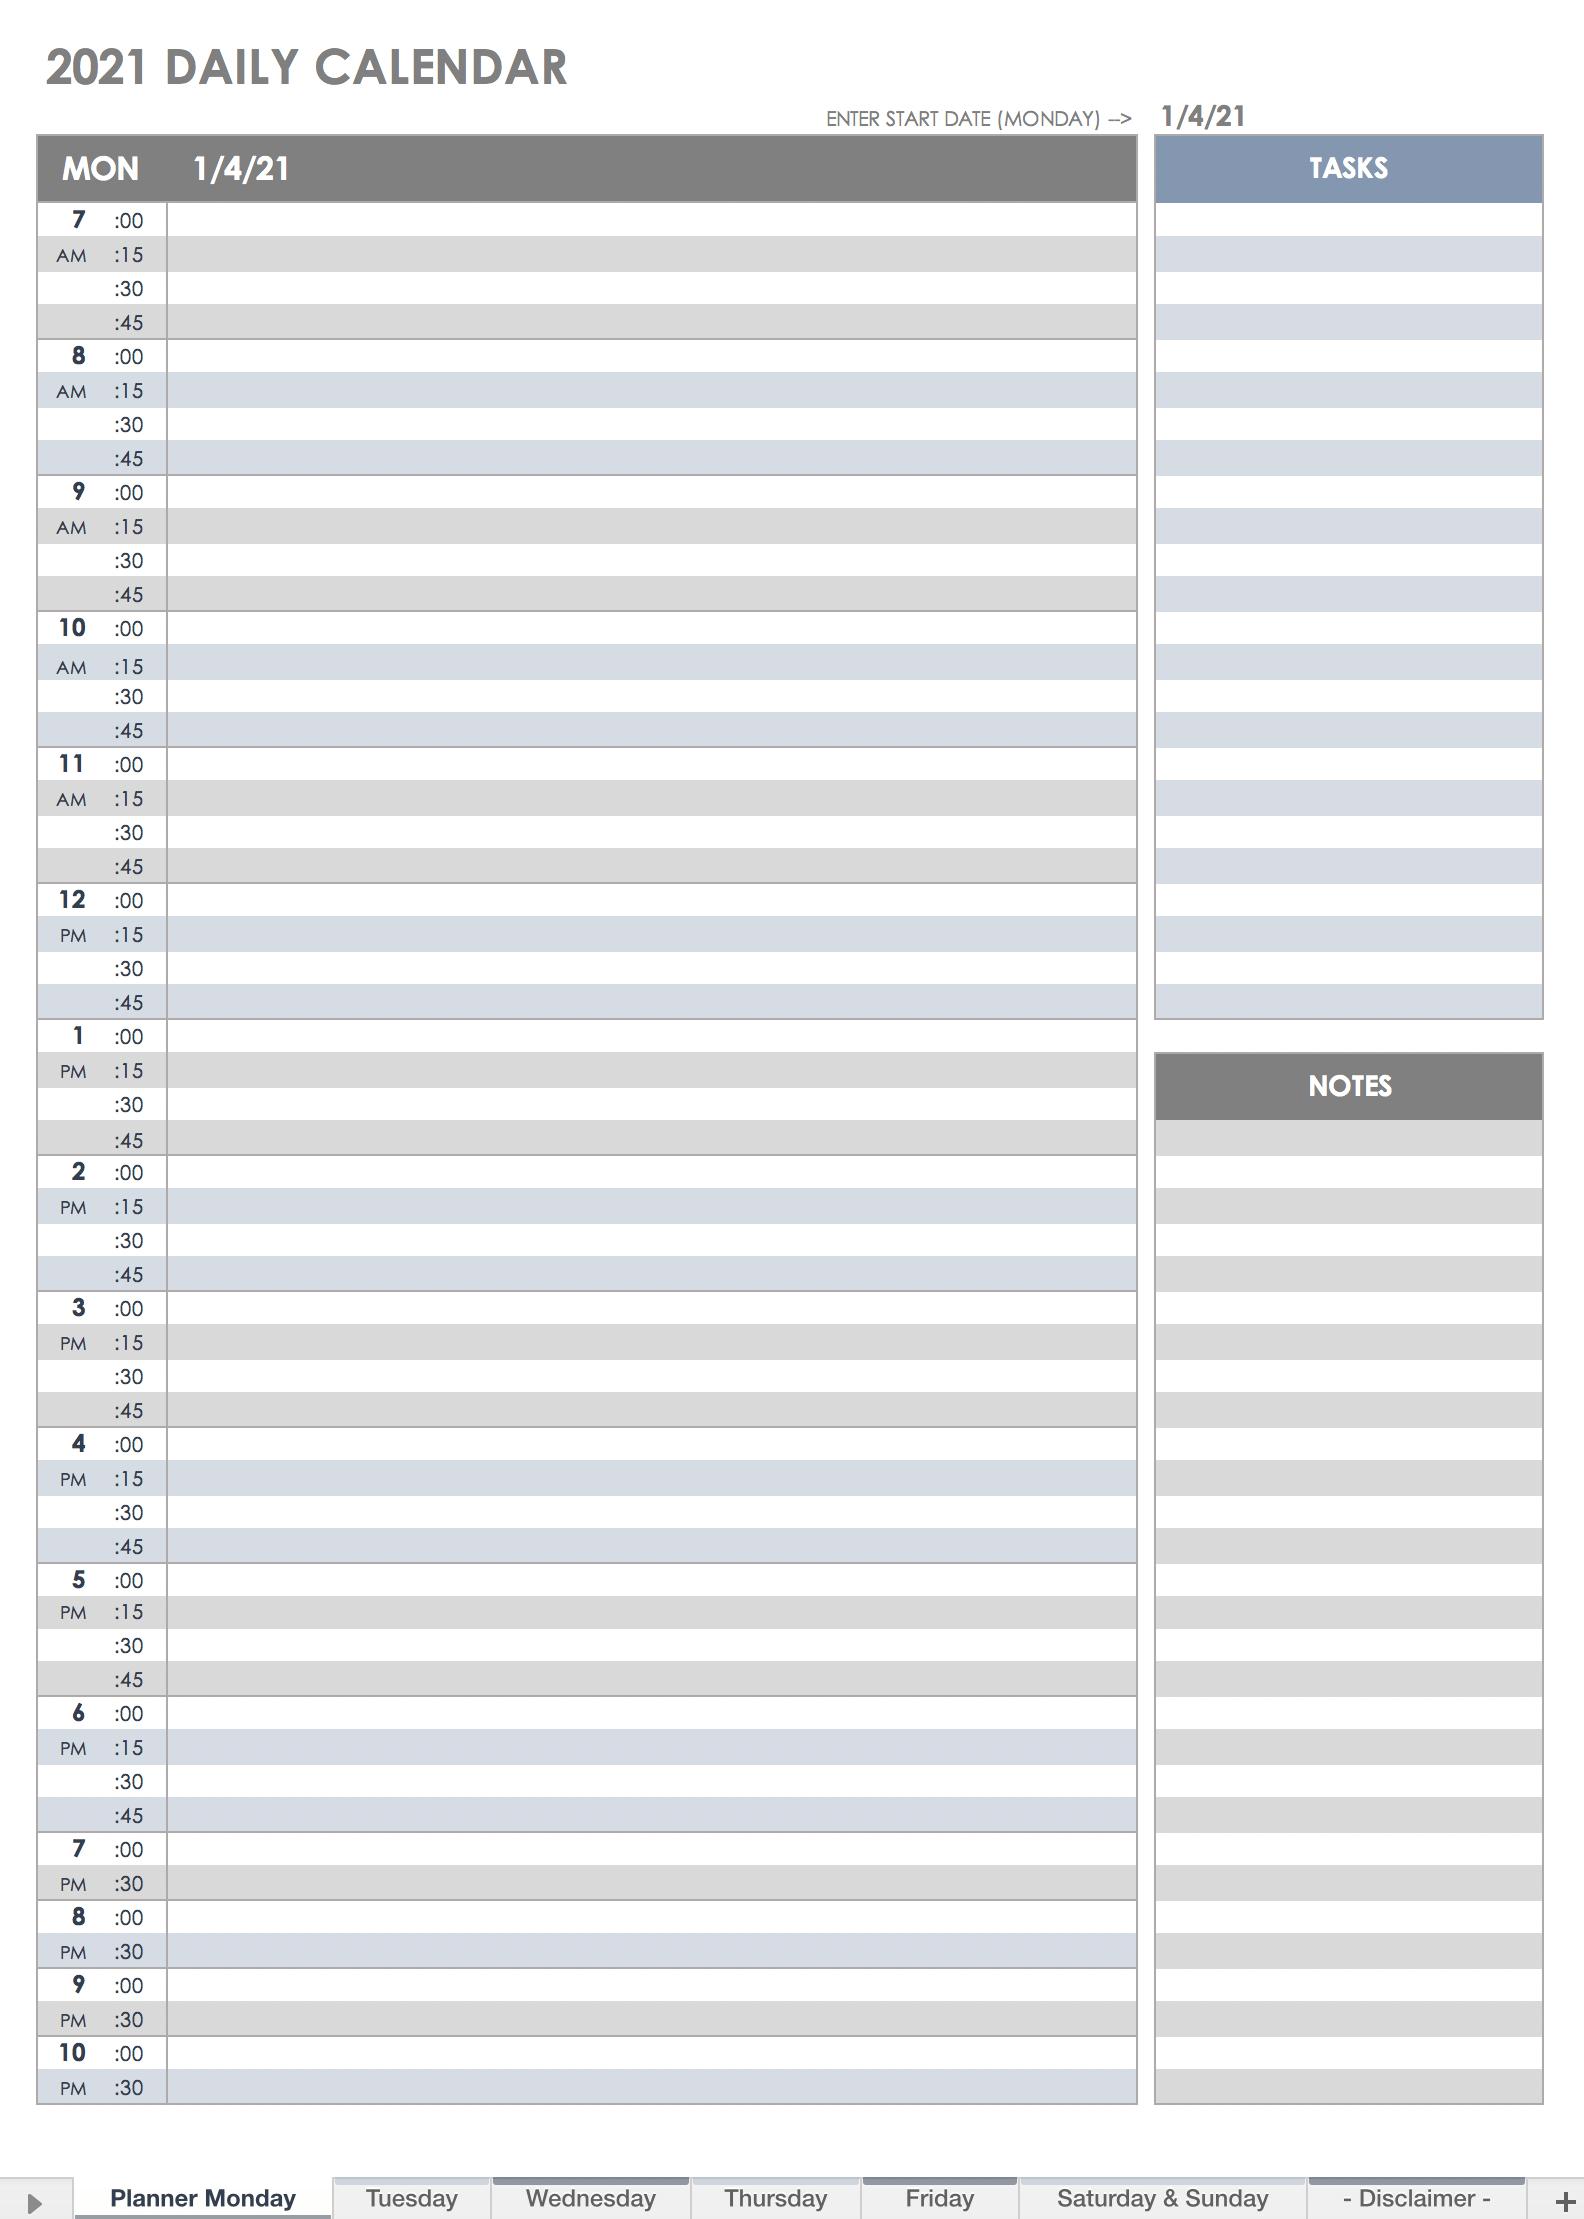 Free Printable Daily Calendar Templates Smartsheet